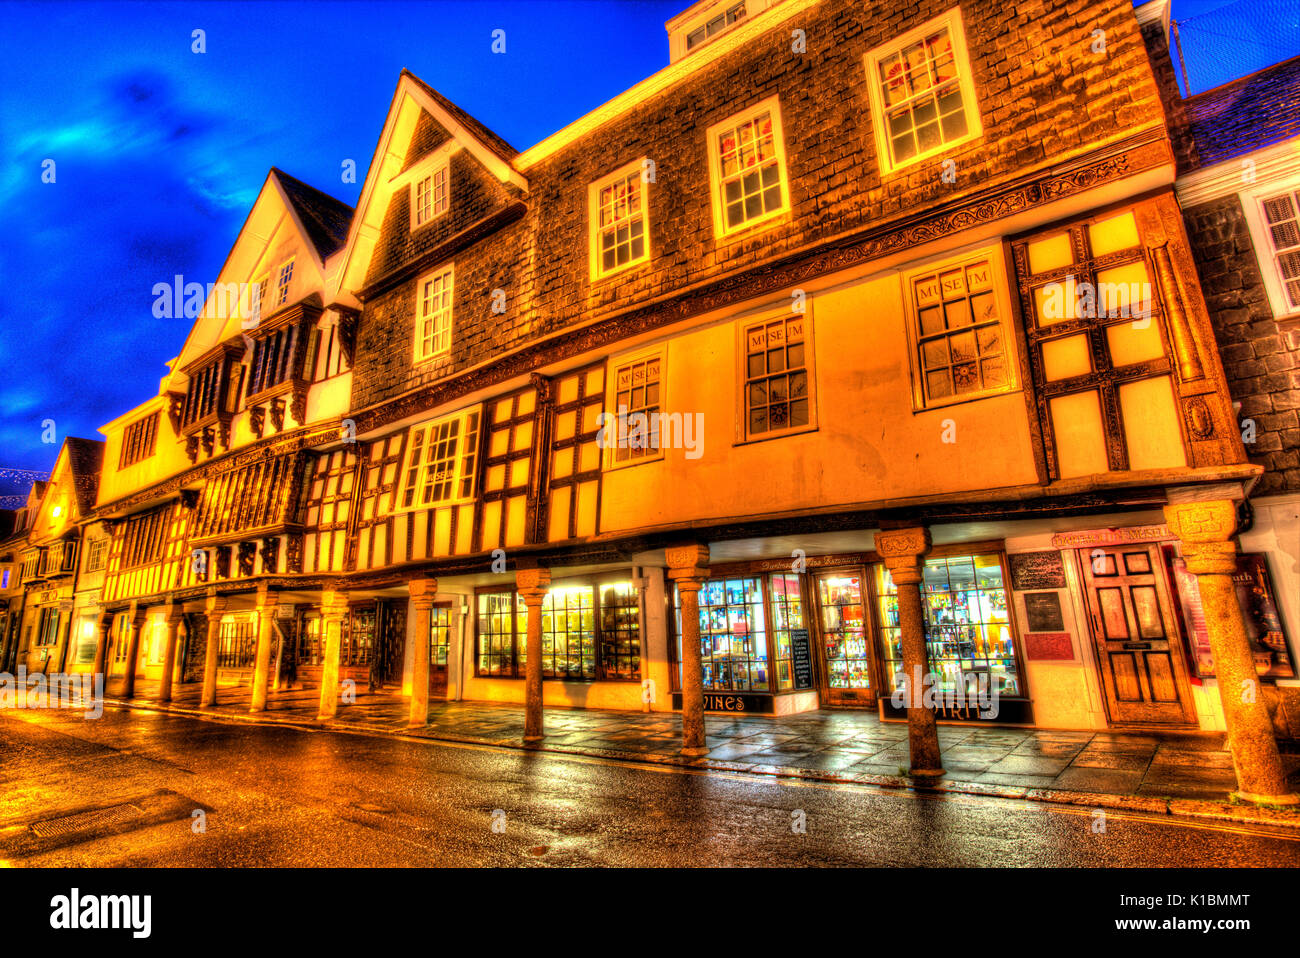 Stadt Dartmouth, England. Der Klasse I aufgeführten 17. Jahrhundert Butterwalk in Dartmouth Duke Street. Stockbild